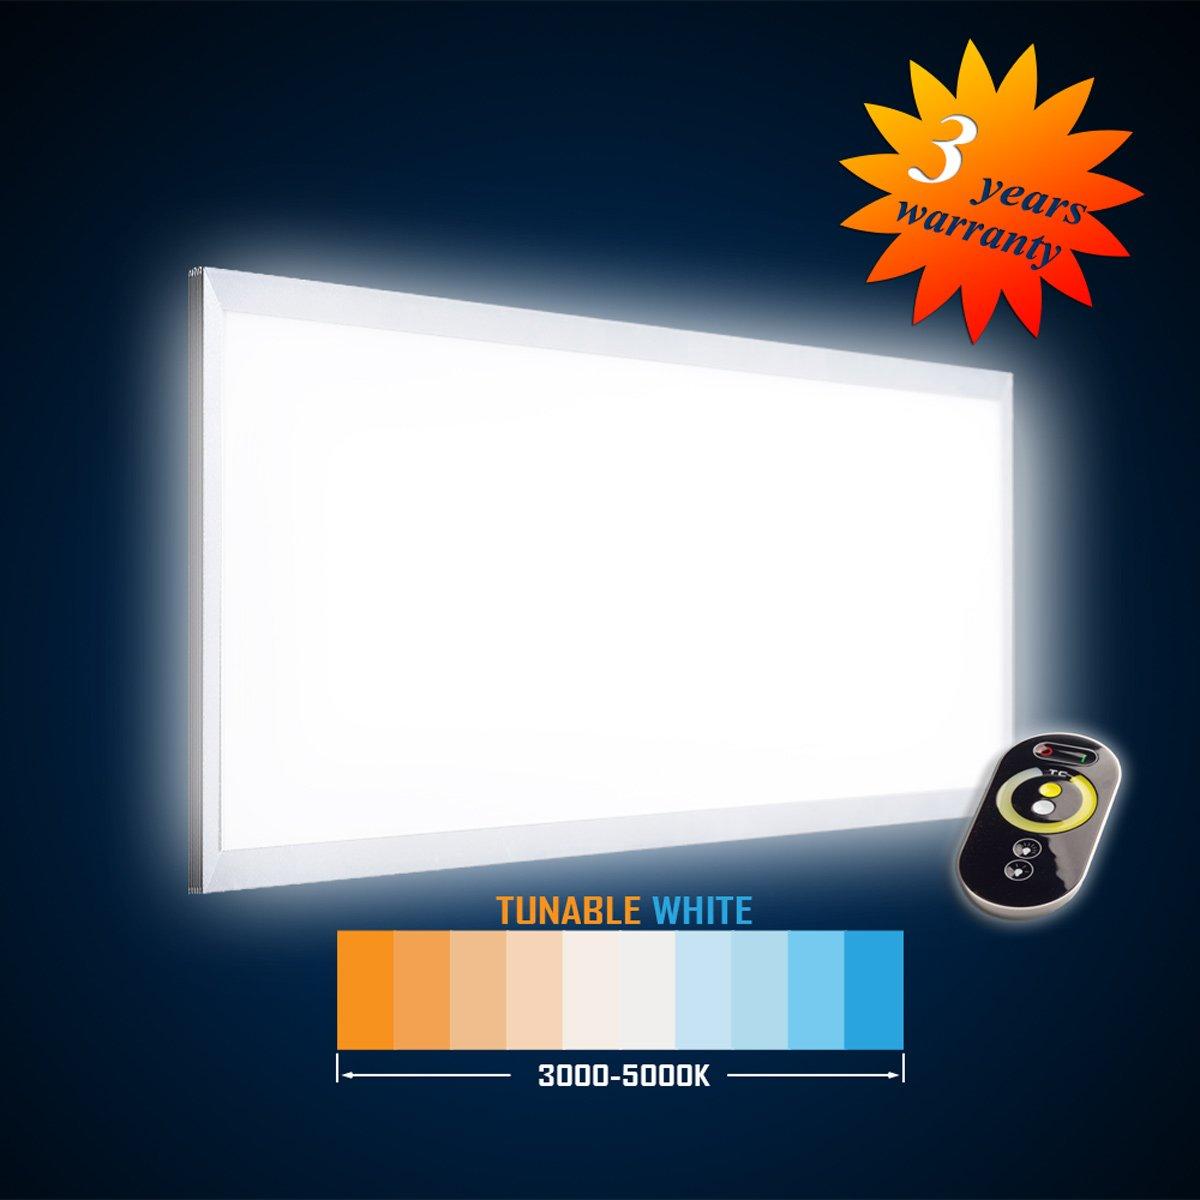 bianco Tunable 1195 x 595 54 W 2700 /– 6000 K Mextronic S Pannello a LED da parete